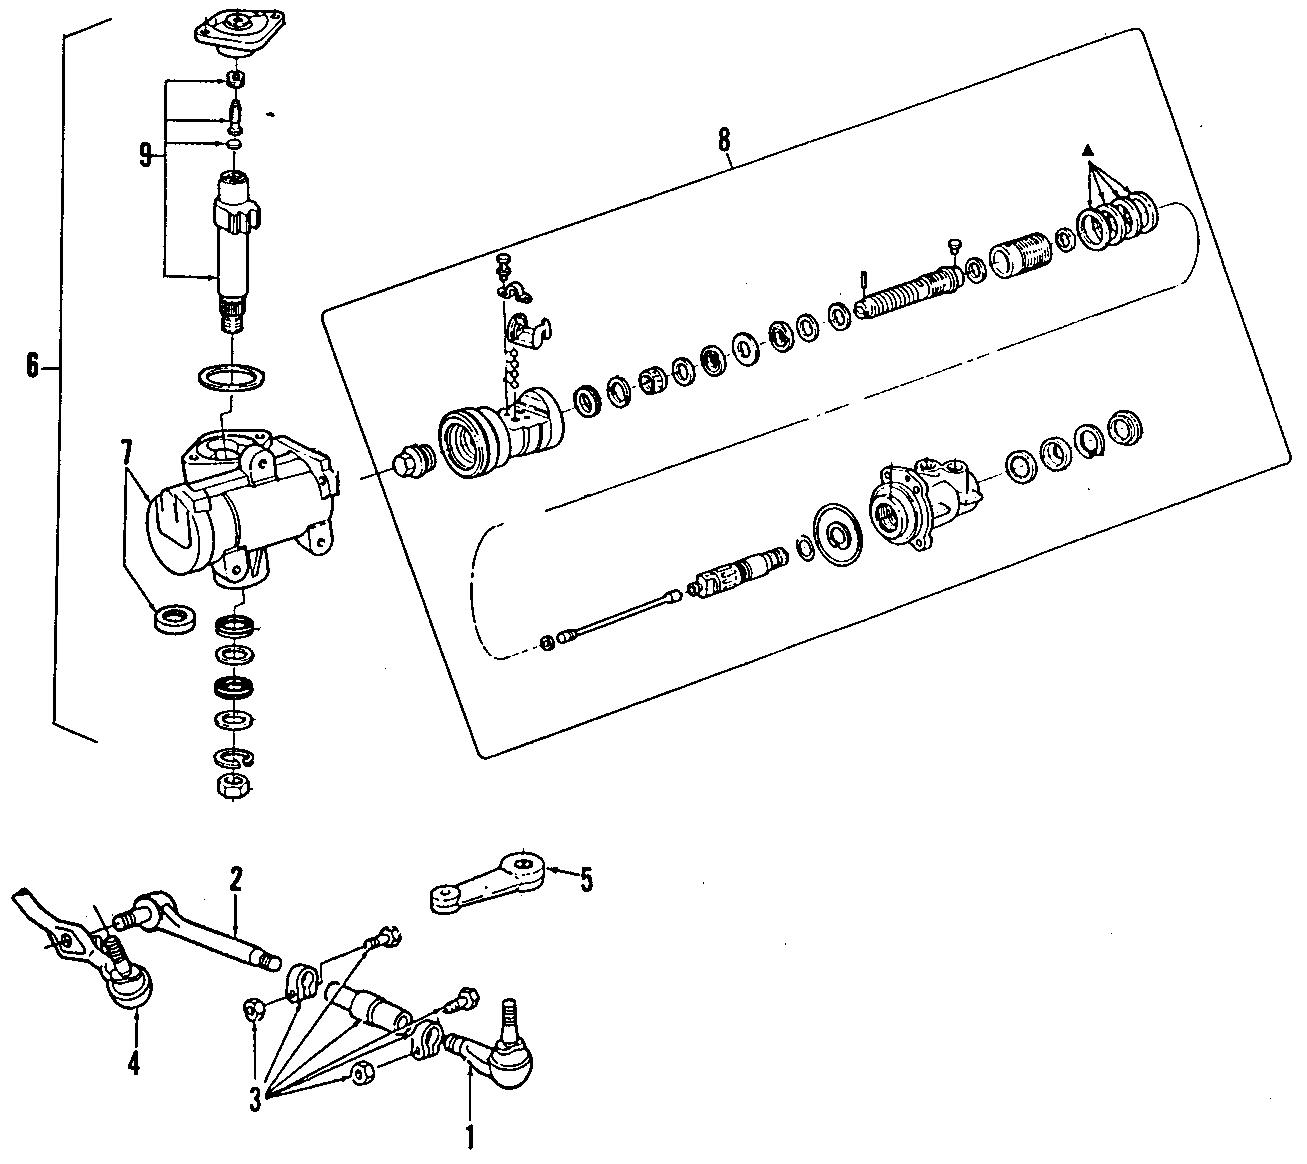 Fozz3a674c